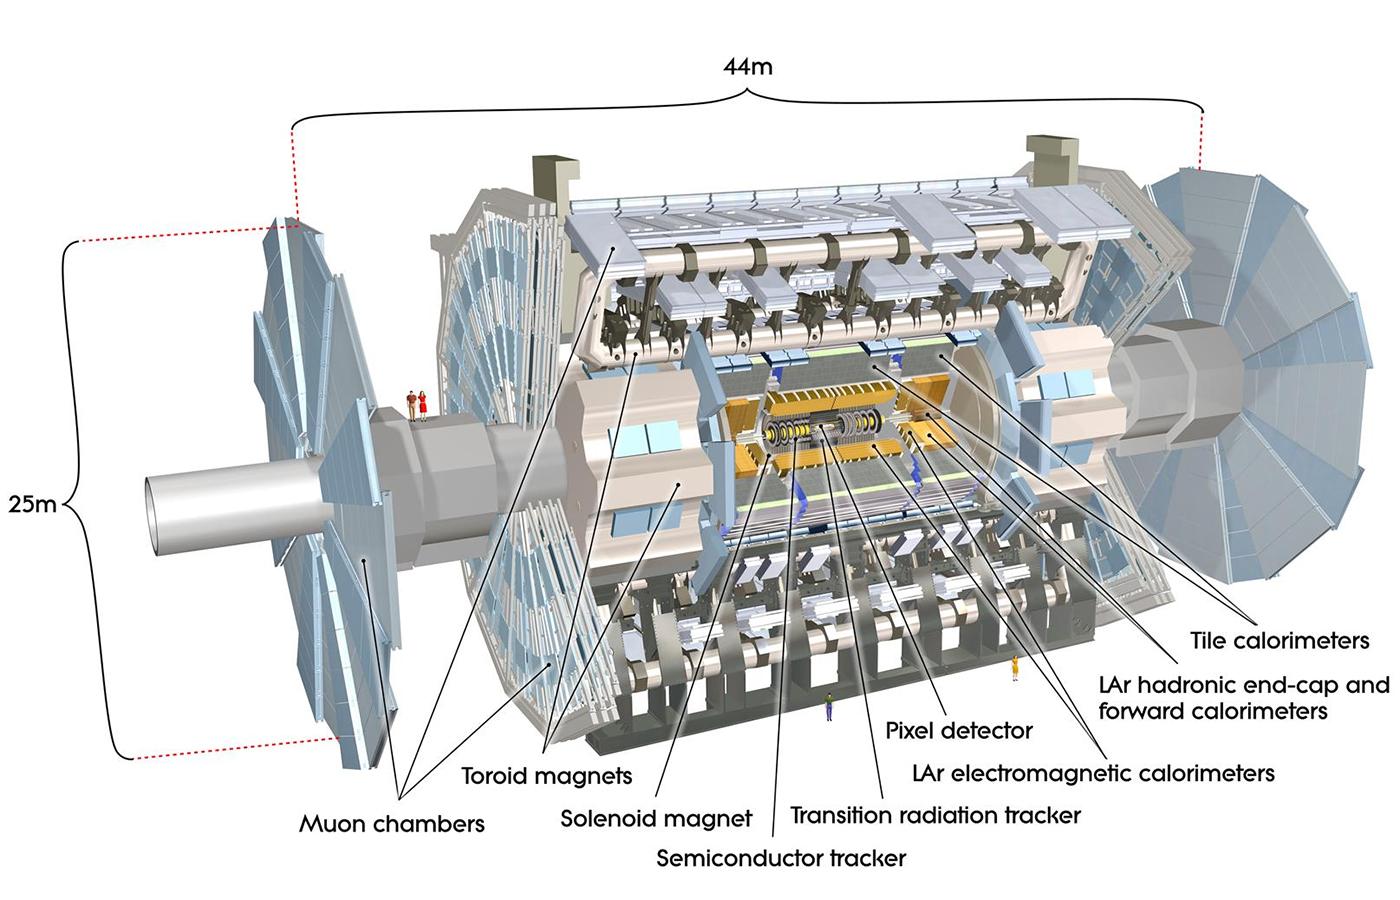 ATLAS Detector at the LHC